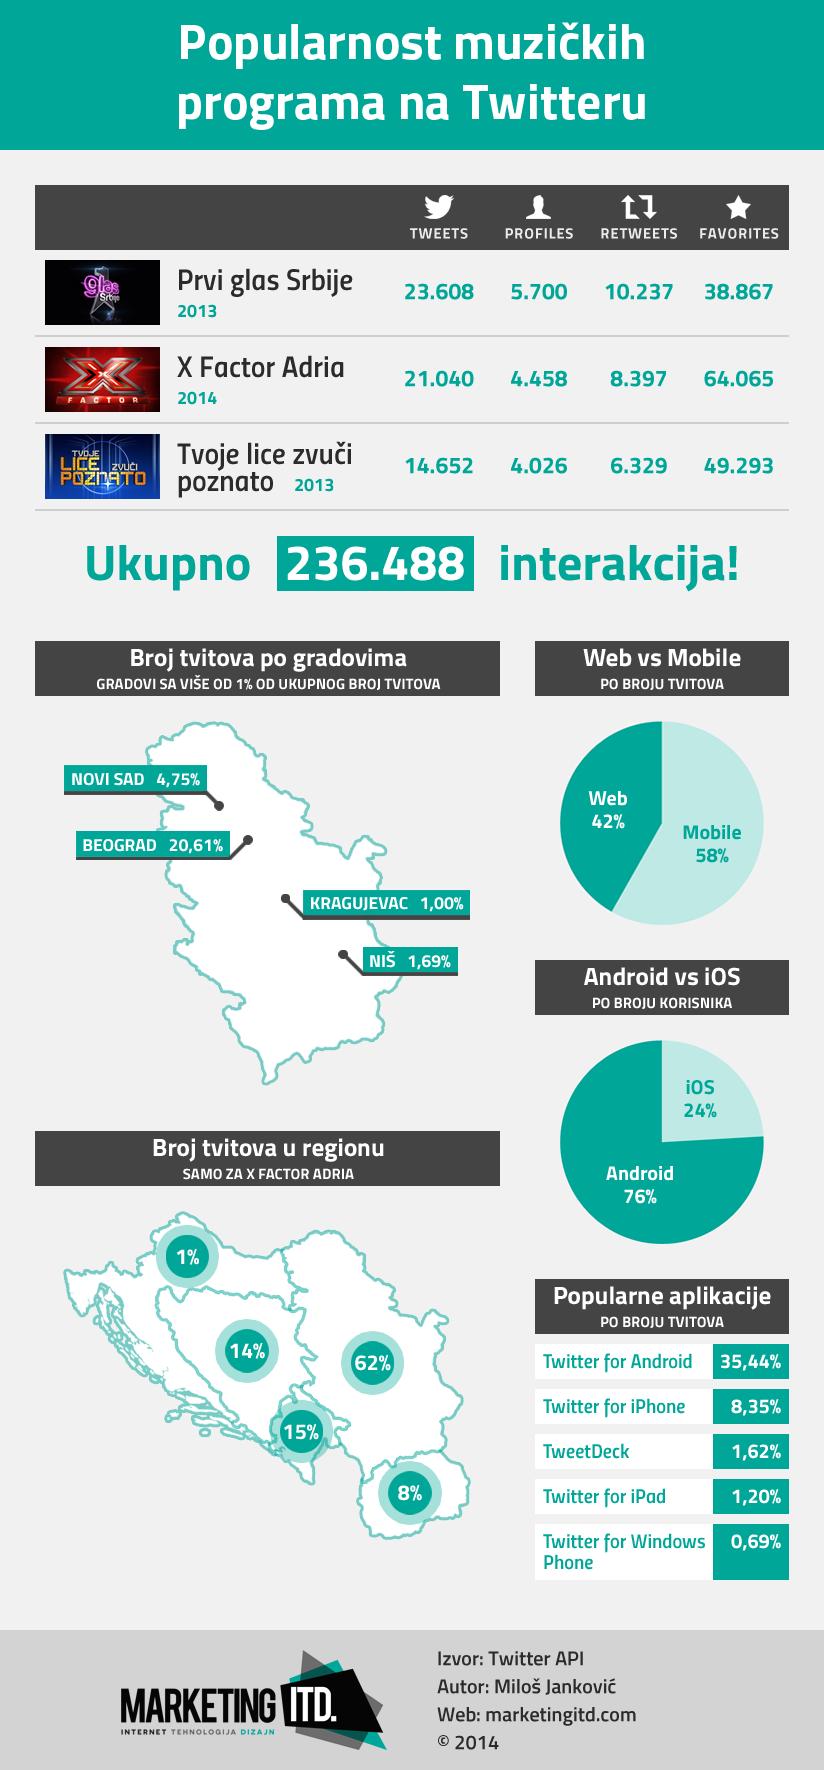 infografik-popularnost-muzickih-programa-na-twitteru